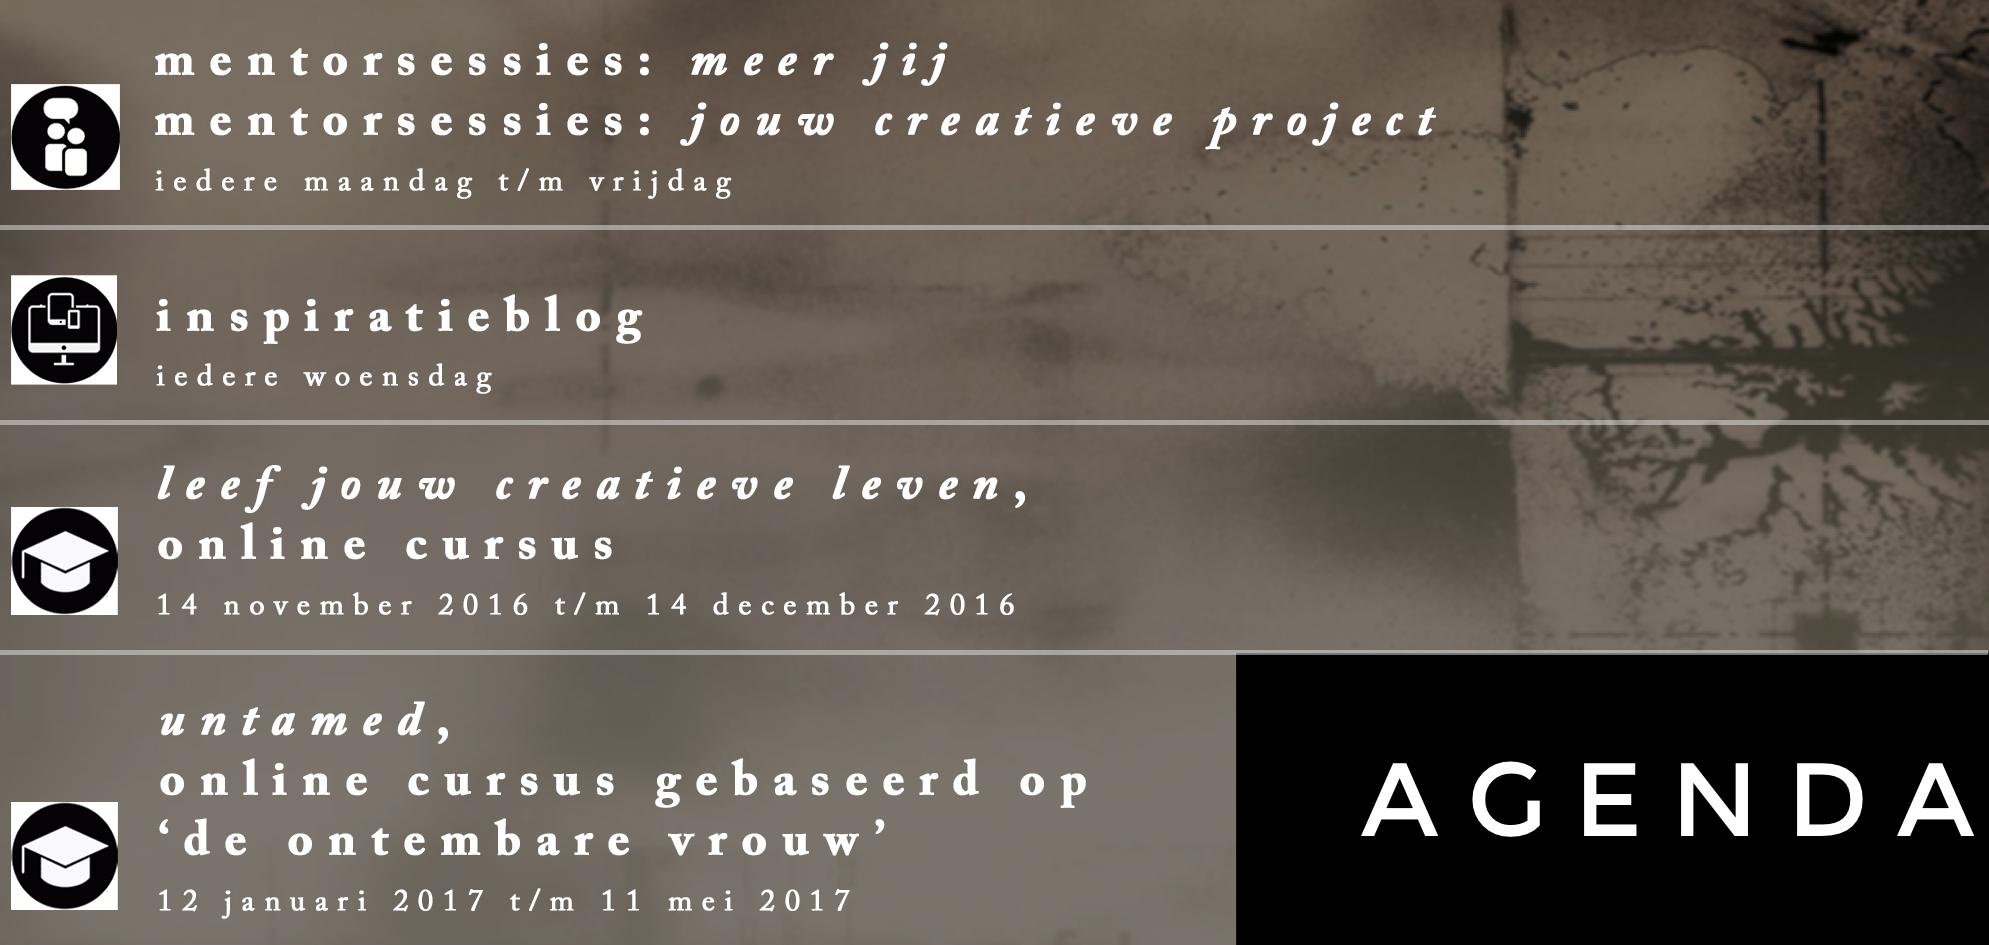 agenda www.studiopolle.nl